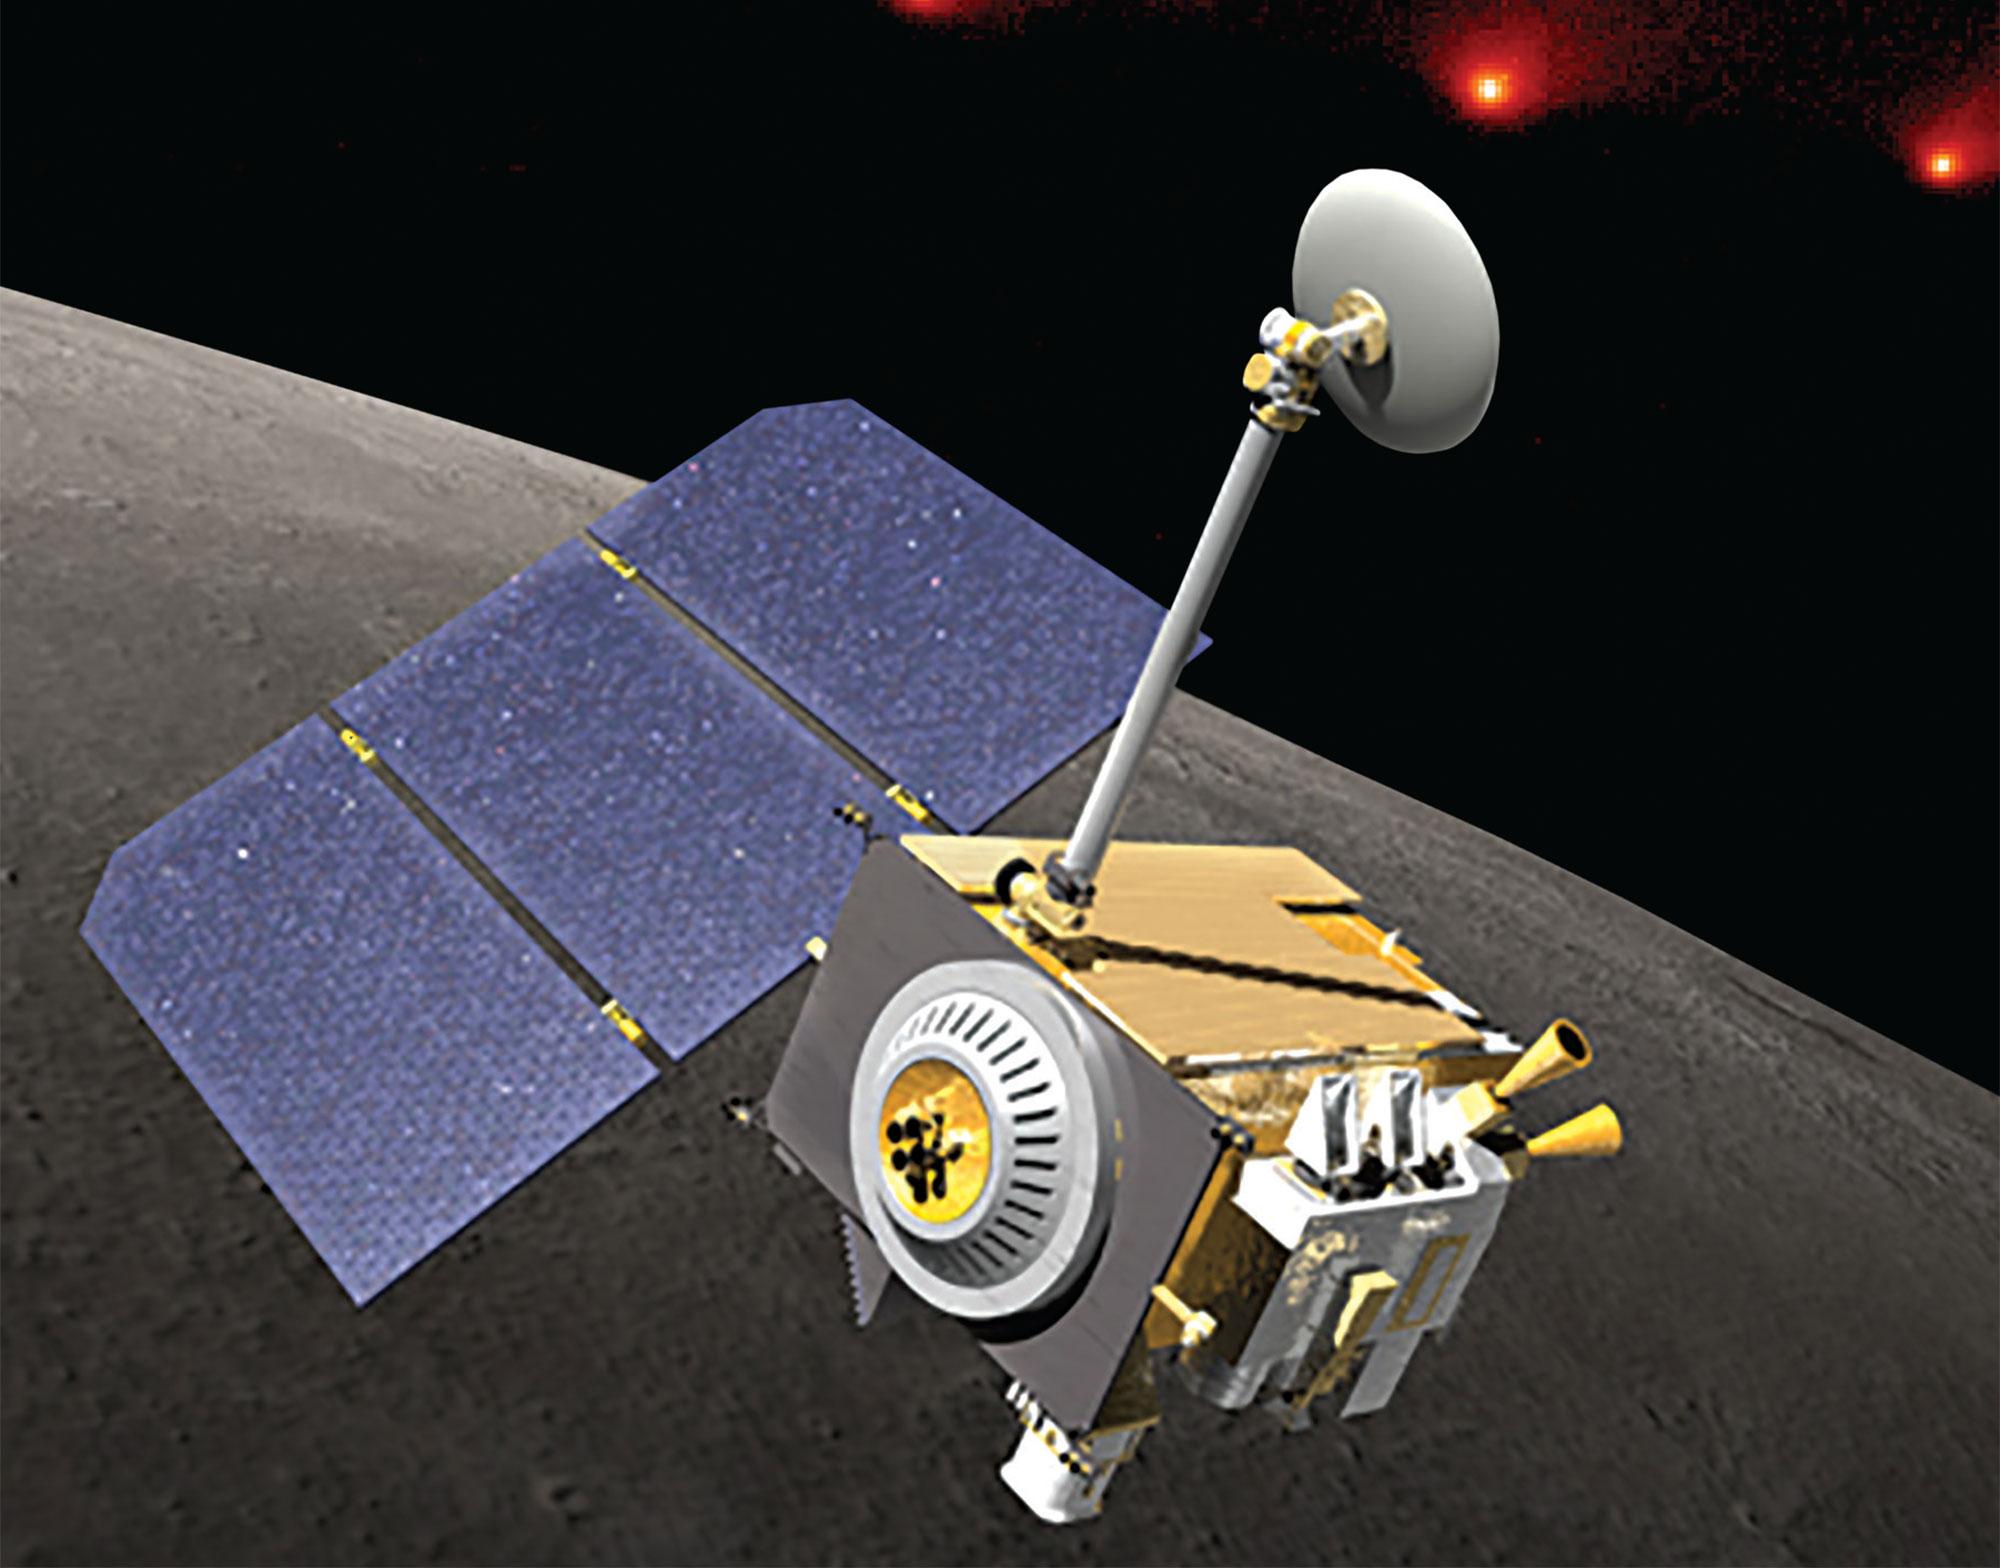 Lunar Reconnaissance Orbiter Camera (LROC) & Shoemaker-Levy Comet